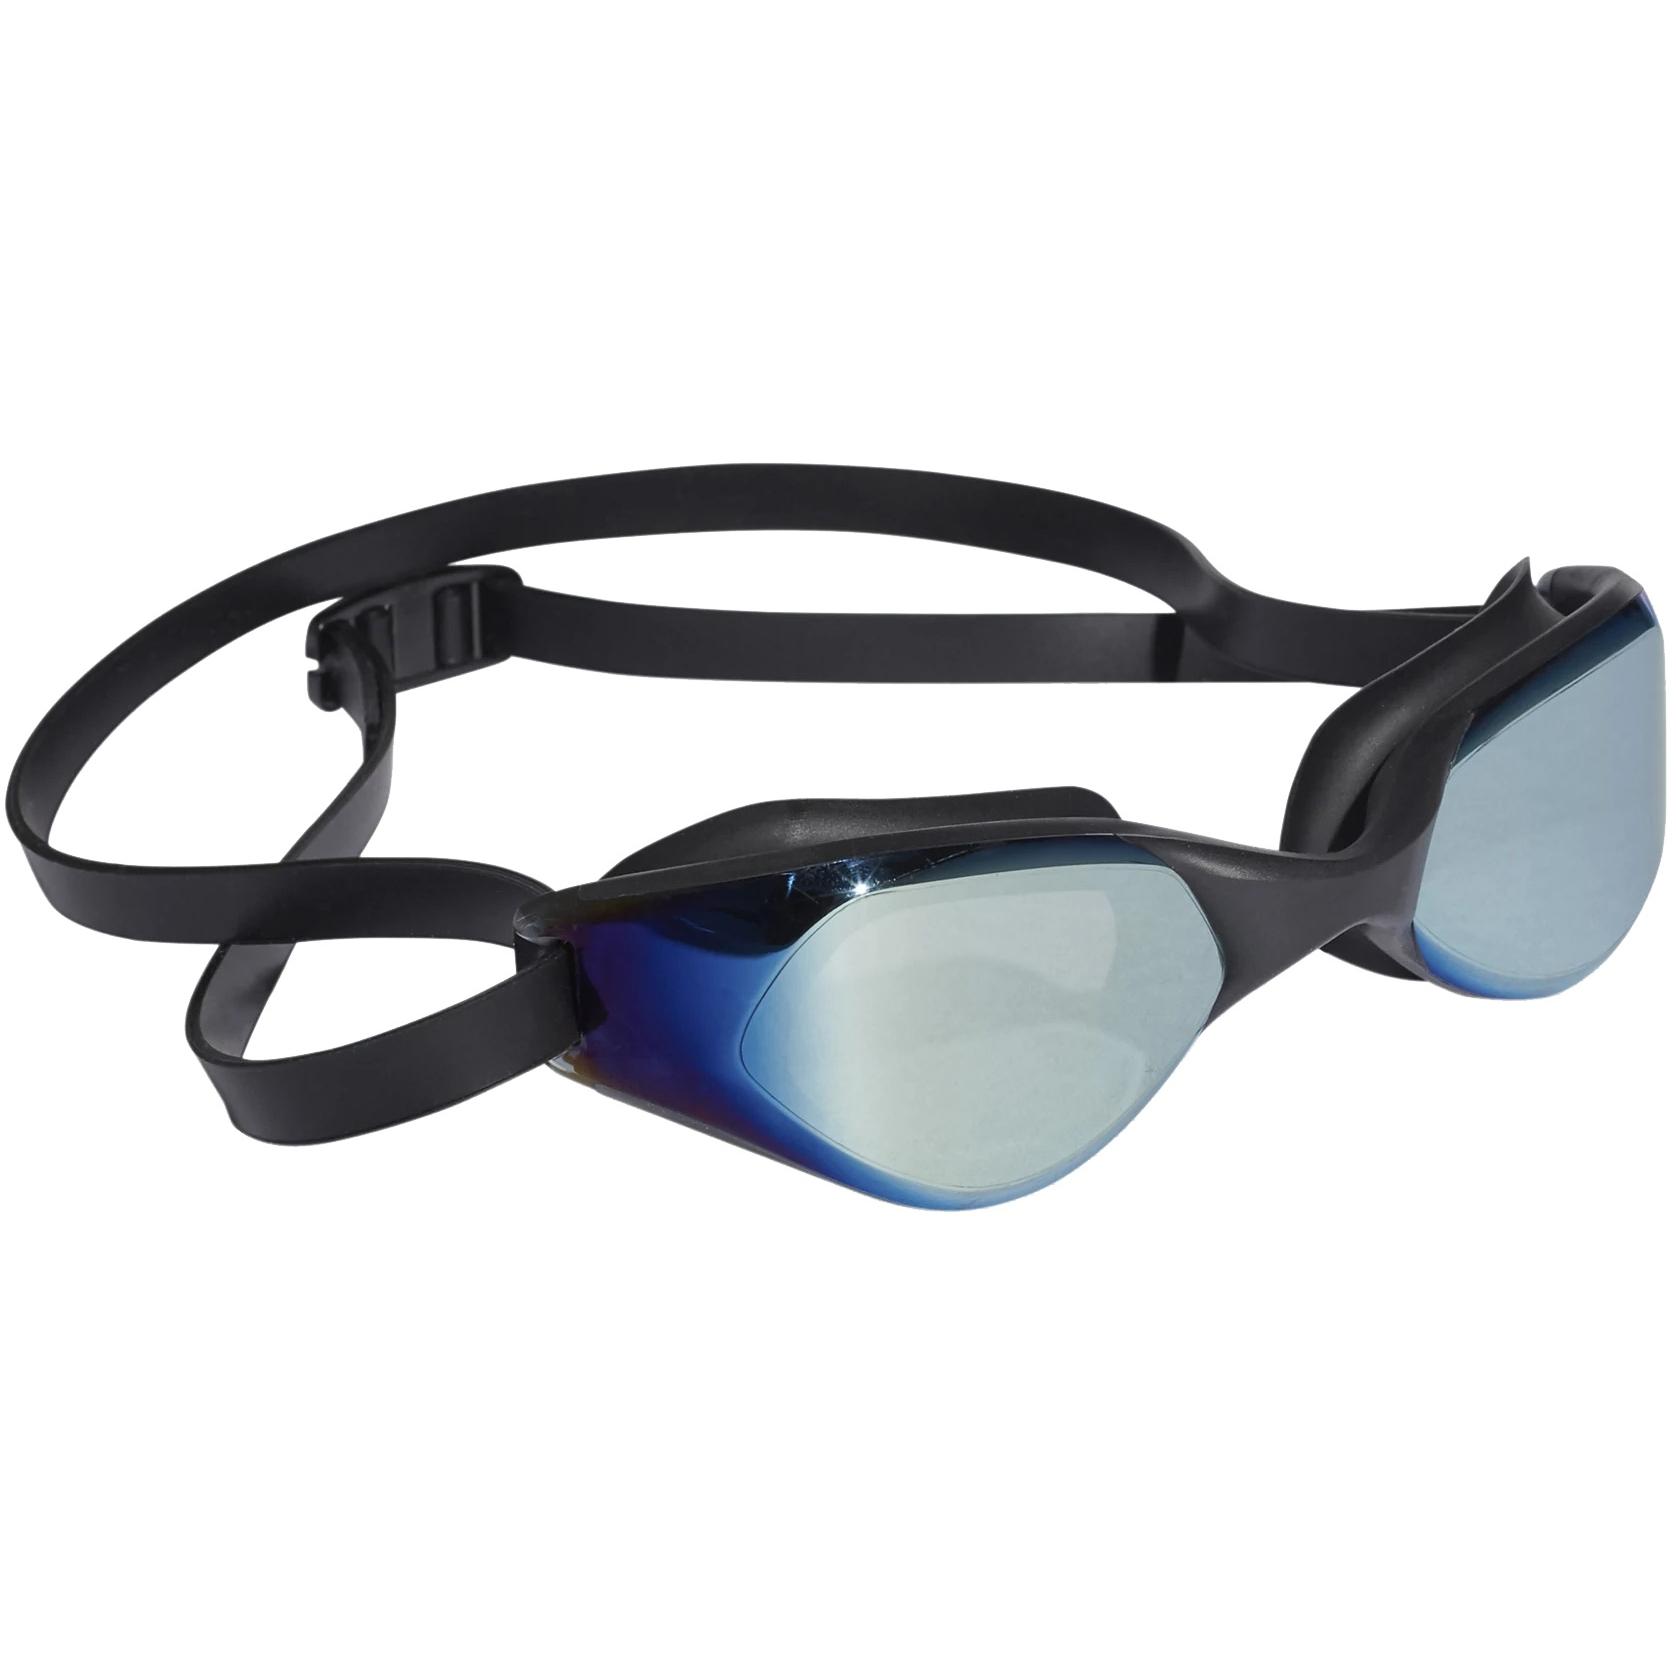 adidas Persistar Comfort Mirrored Swim Goggles - black/black/black BR1117